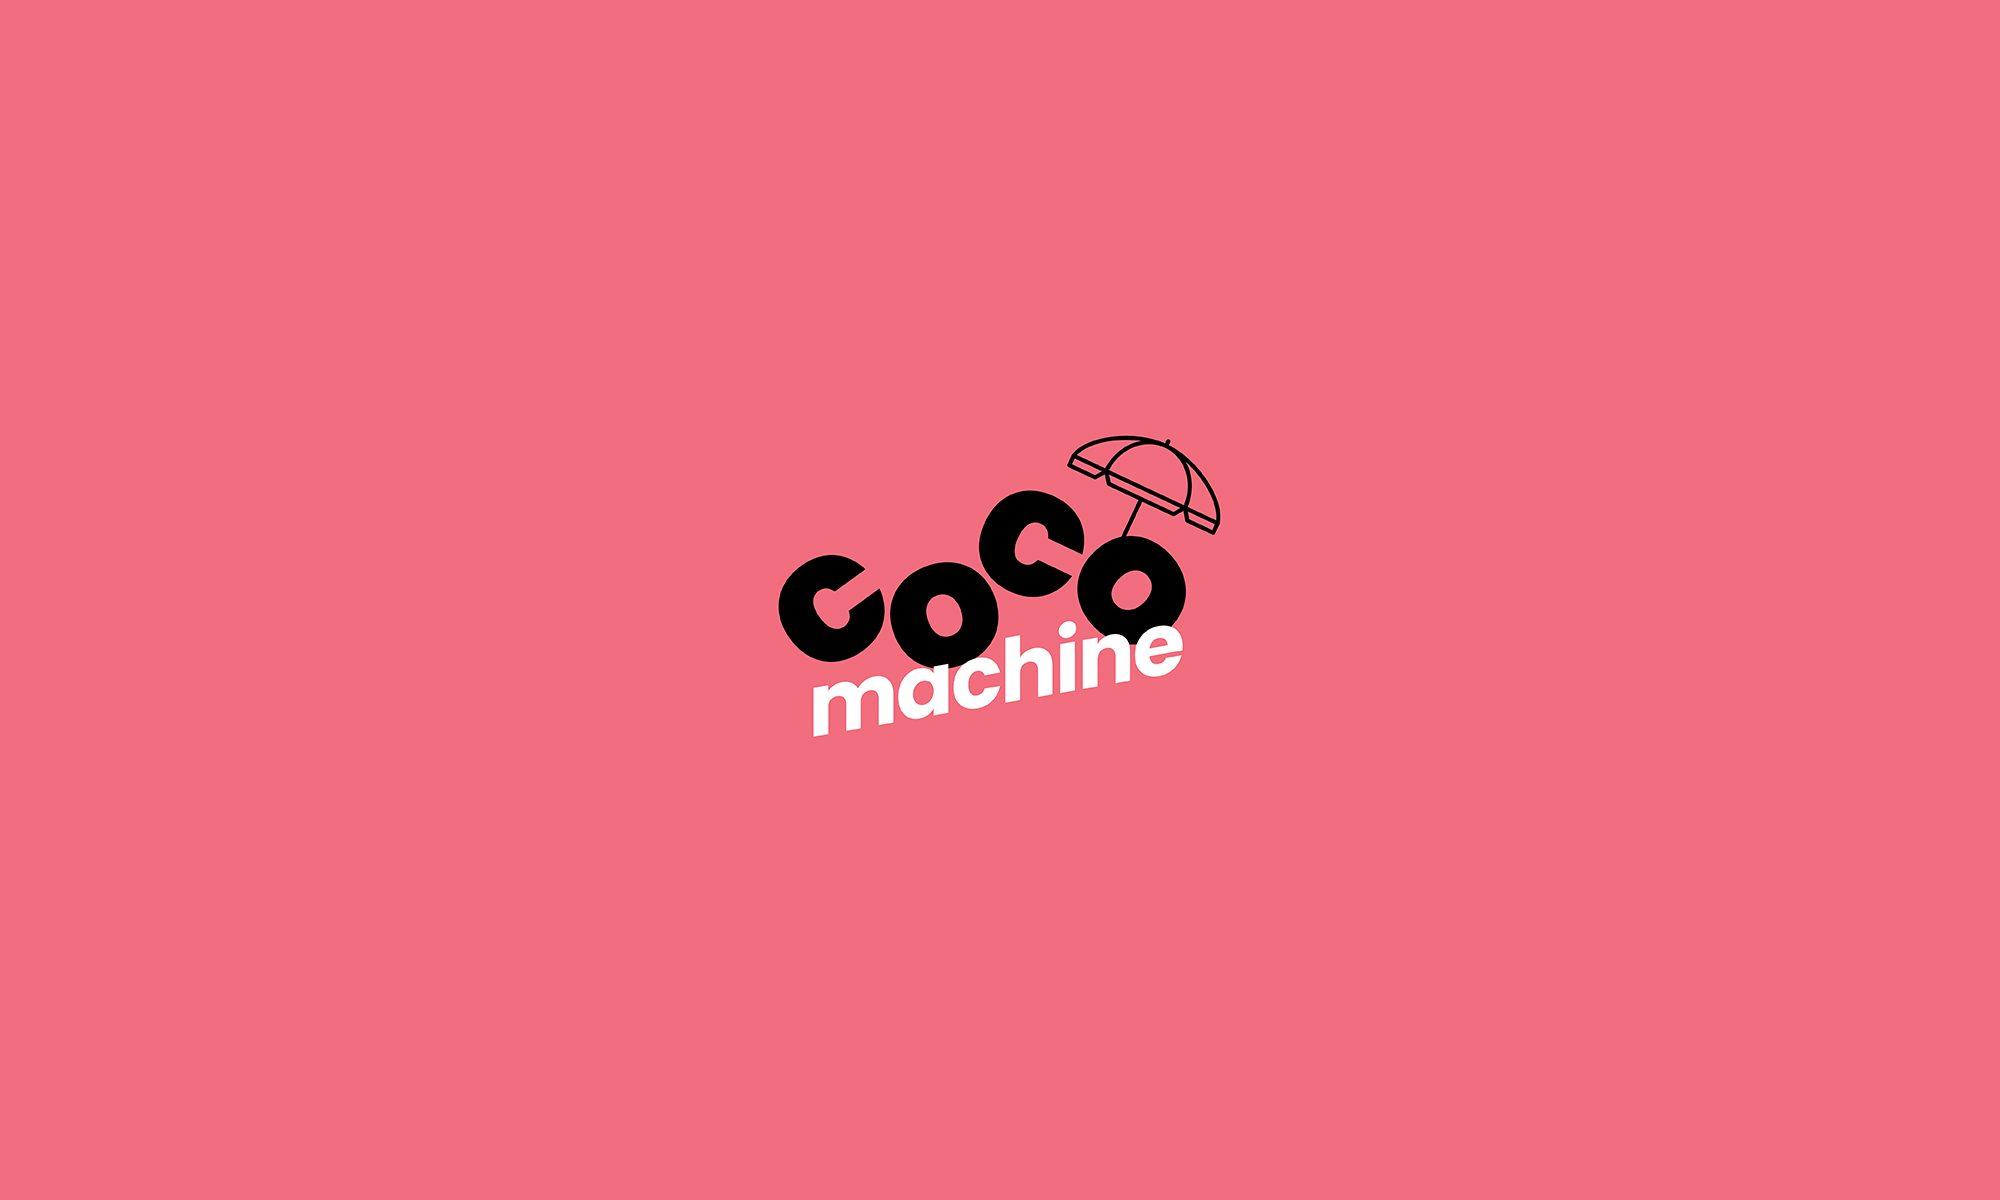 Cocomachine